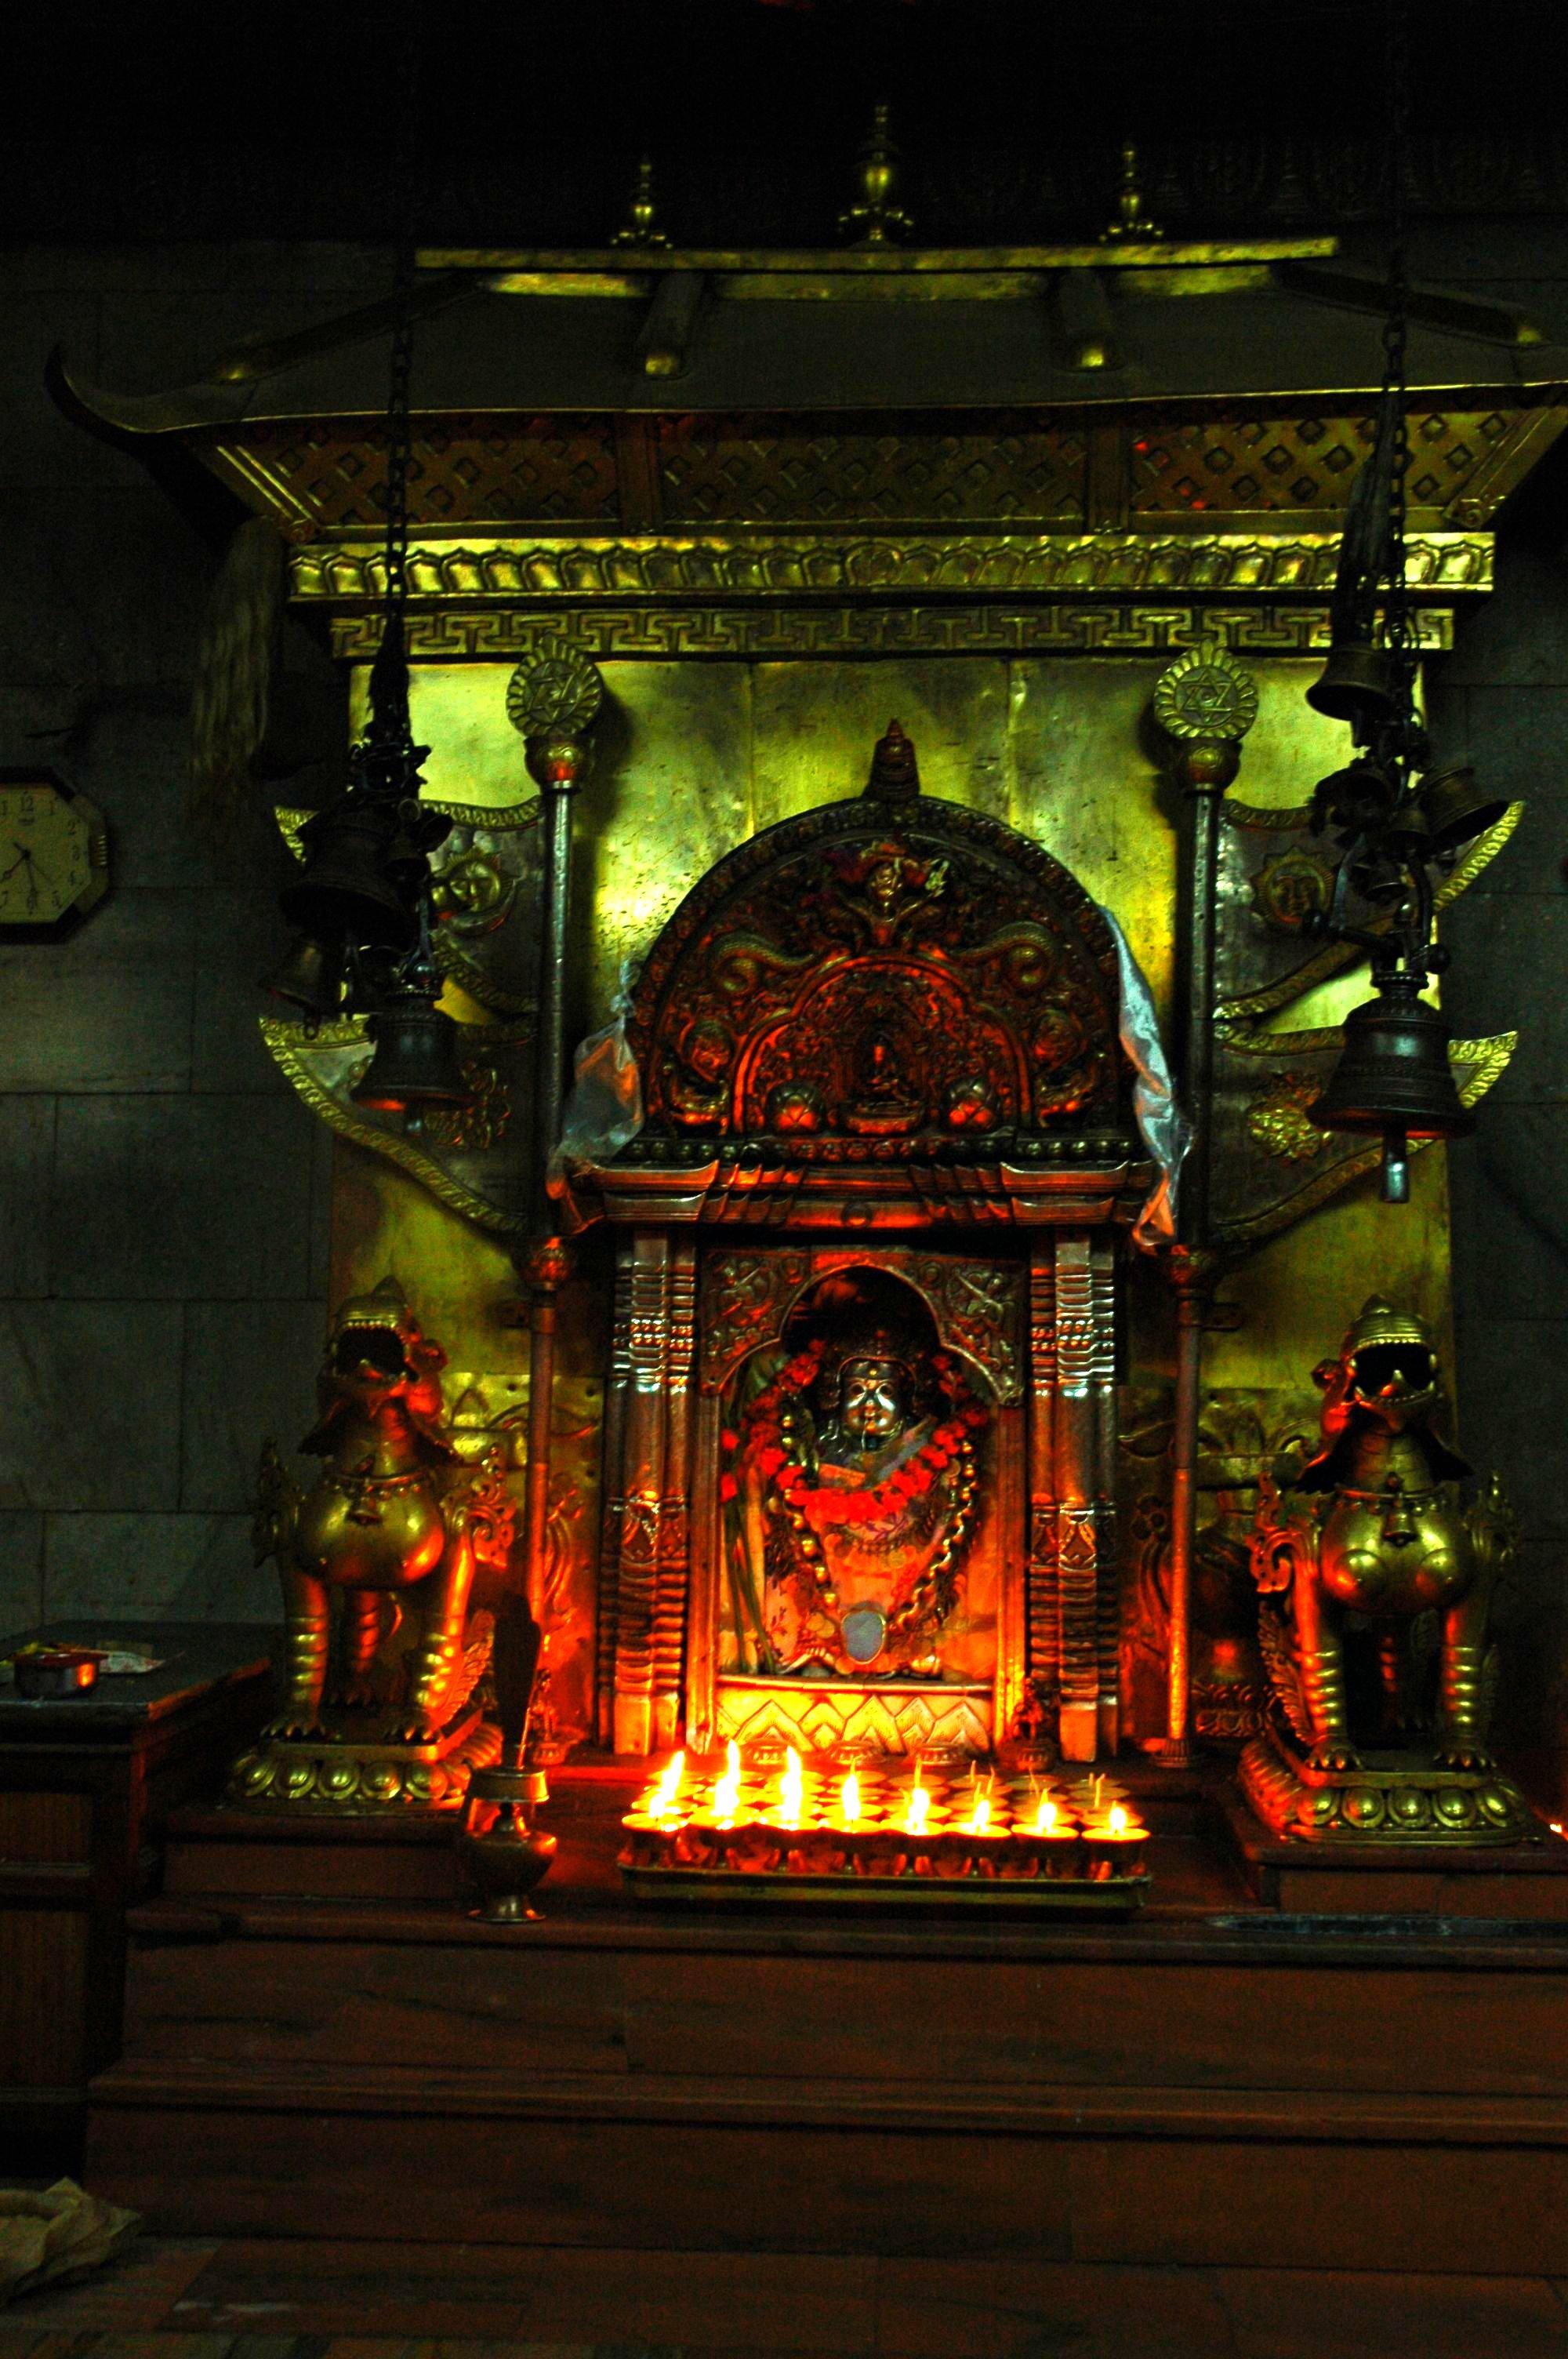 Bhadrakaali Mandir